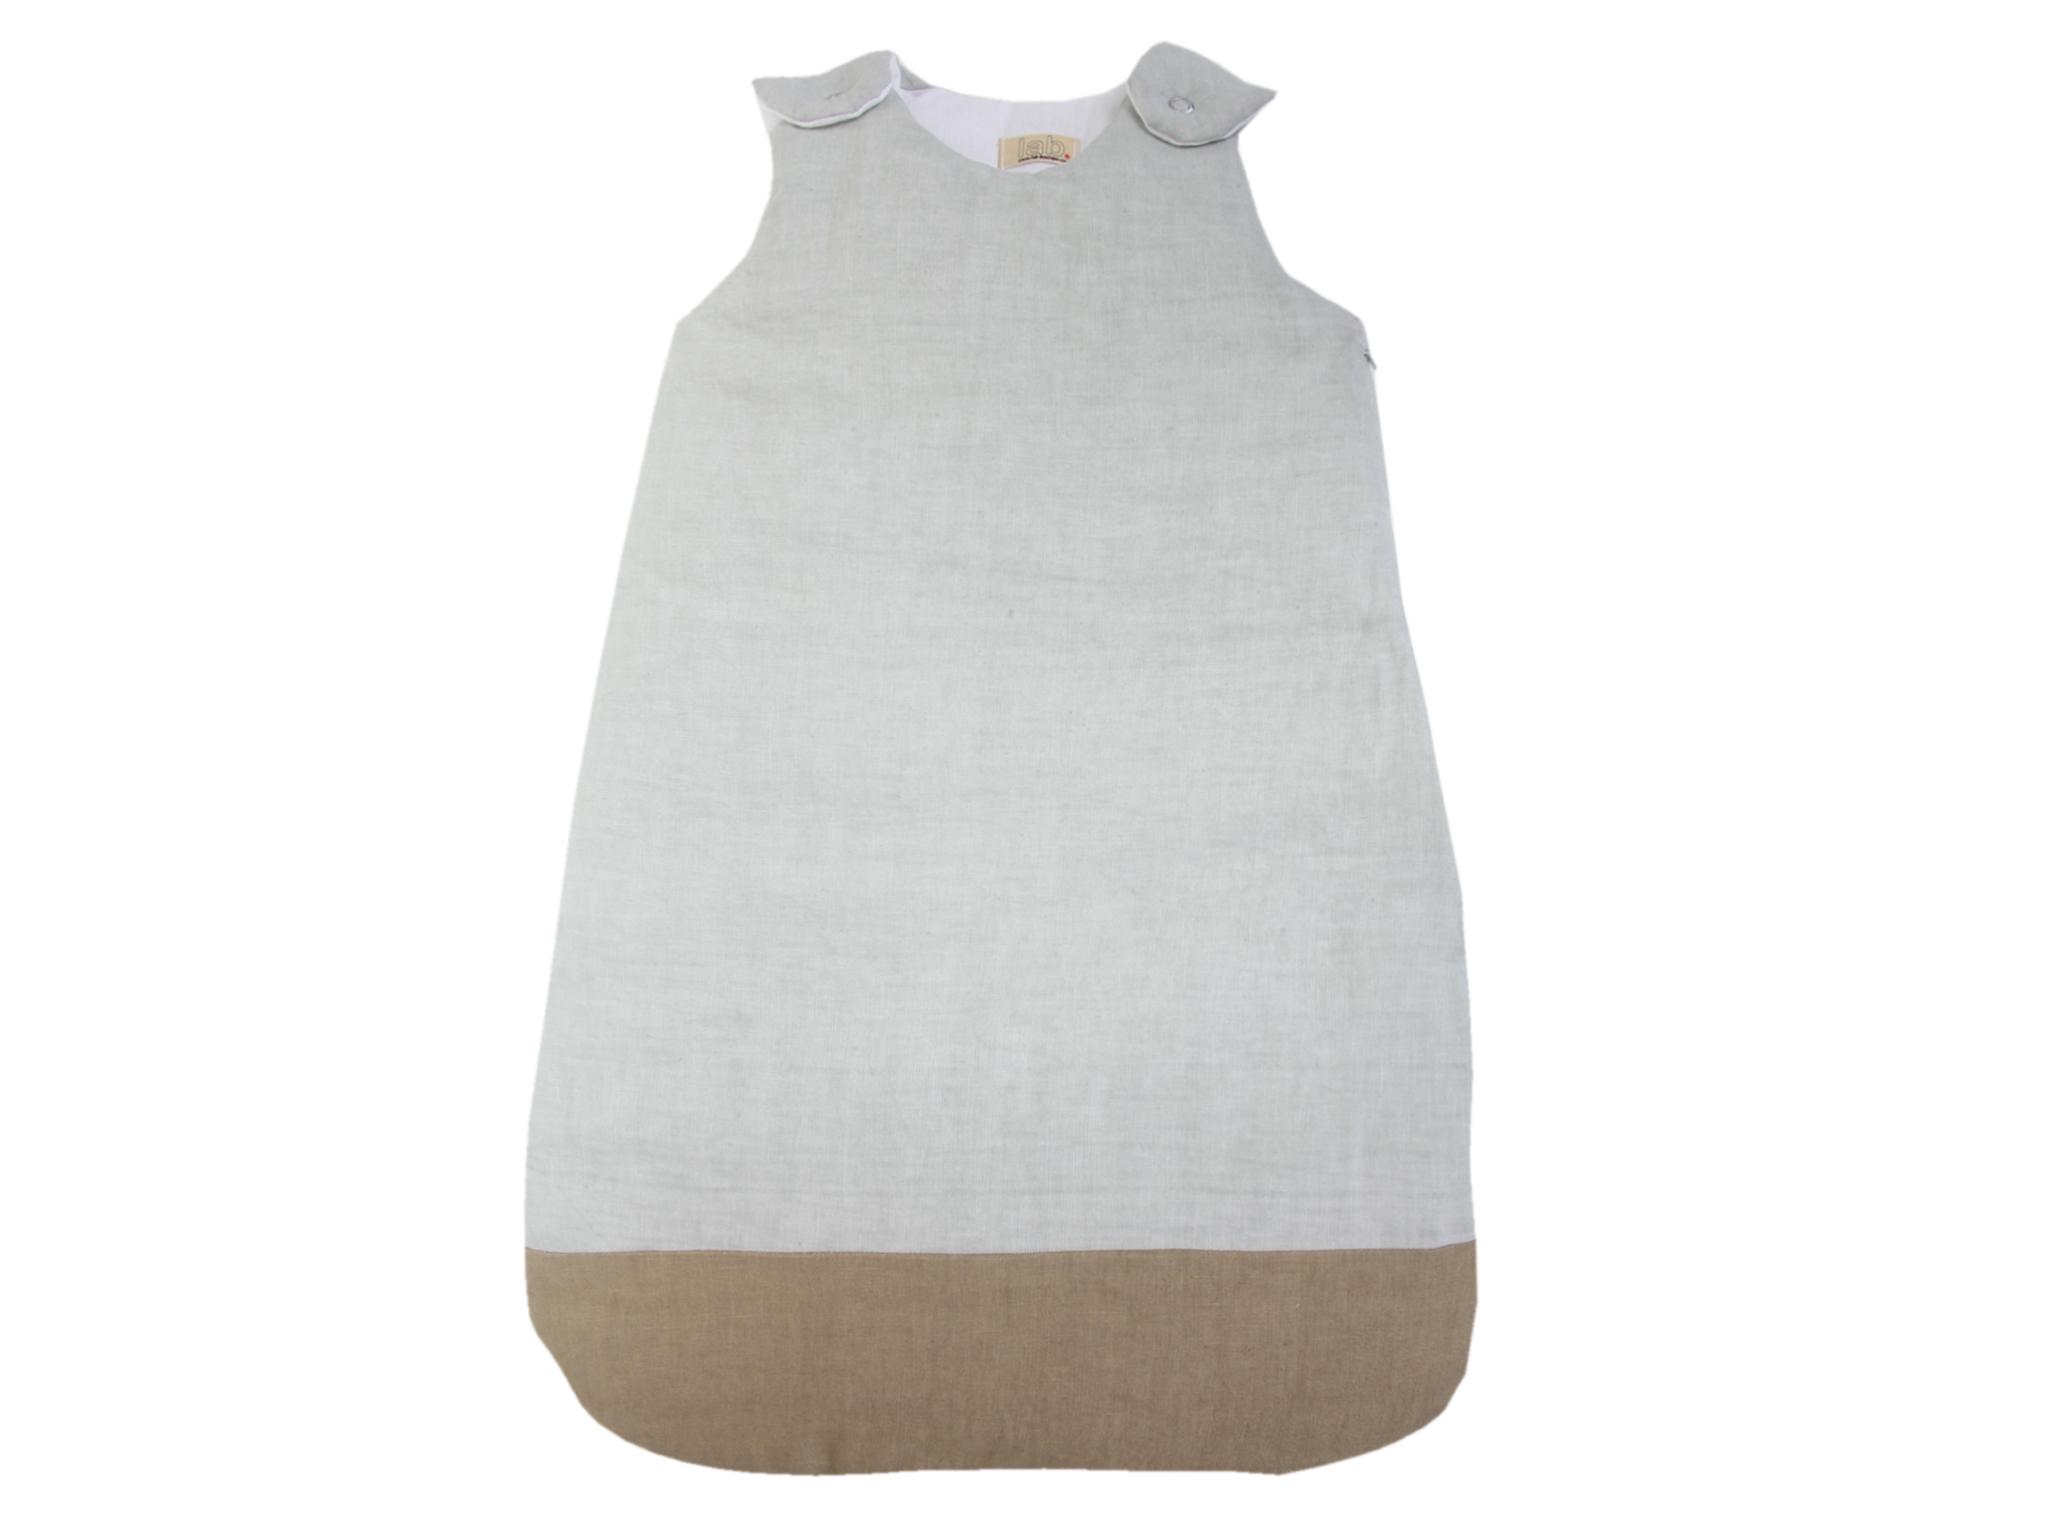 Lab sleeping bag